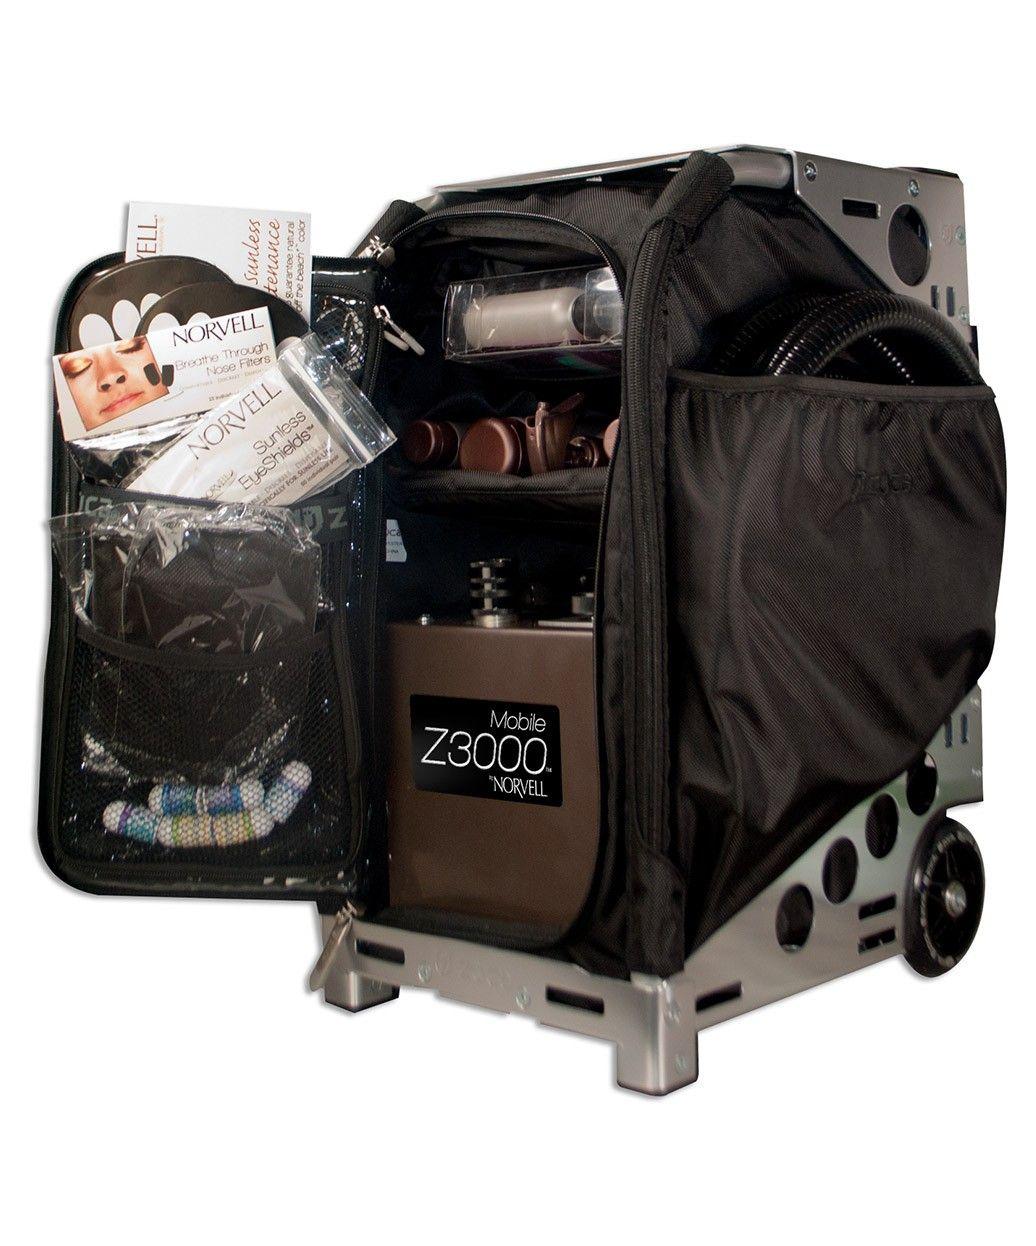 Norvell Sunless Pro Travel Bag Mobile spray tanning